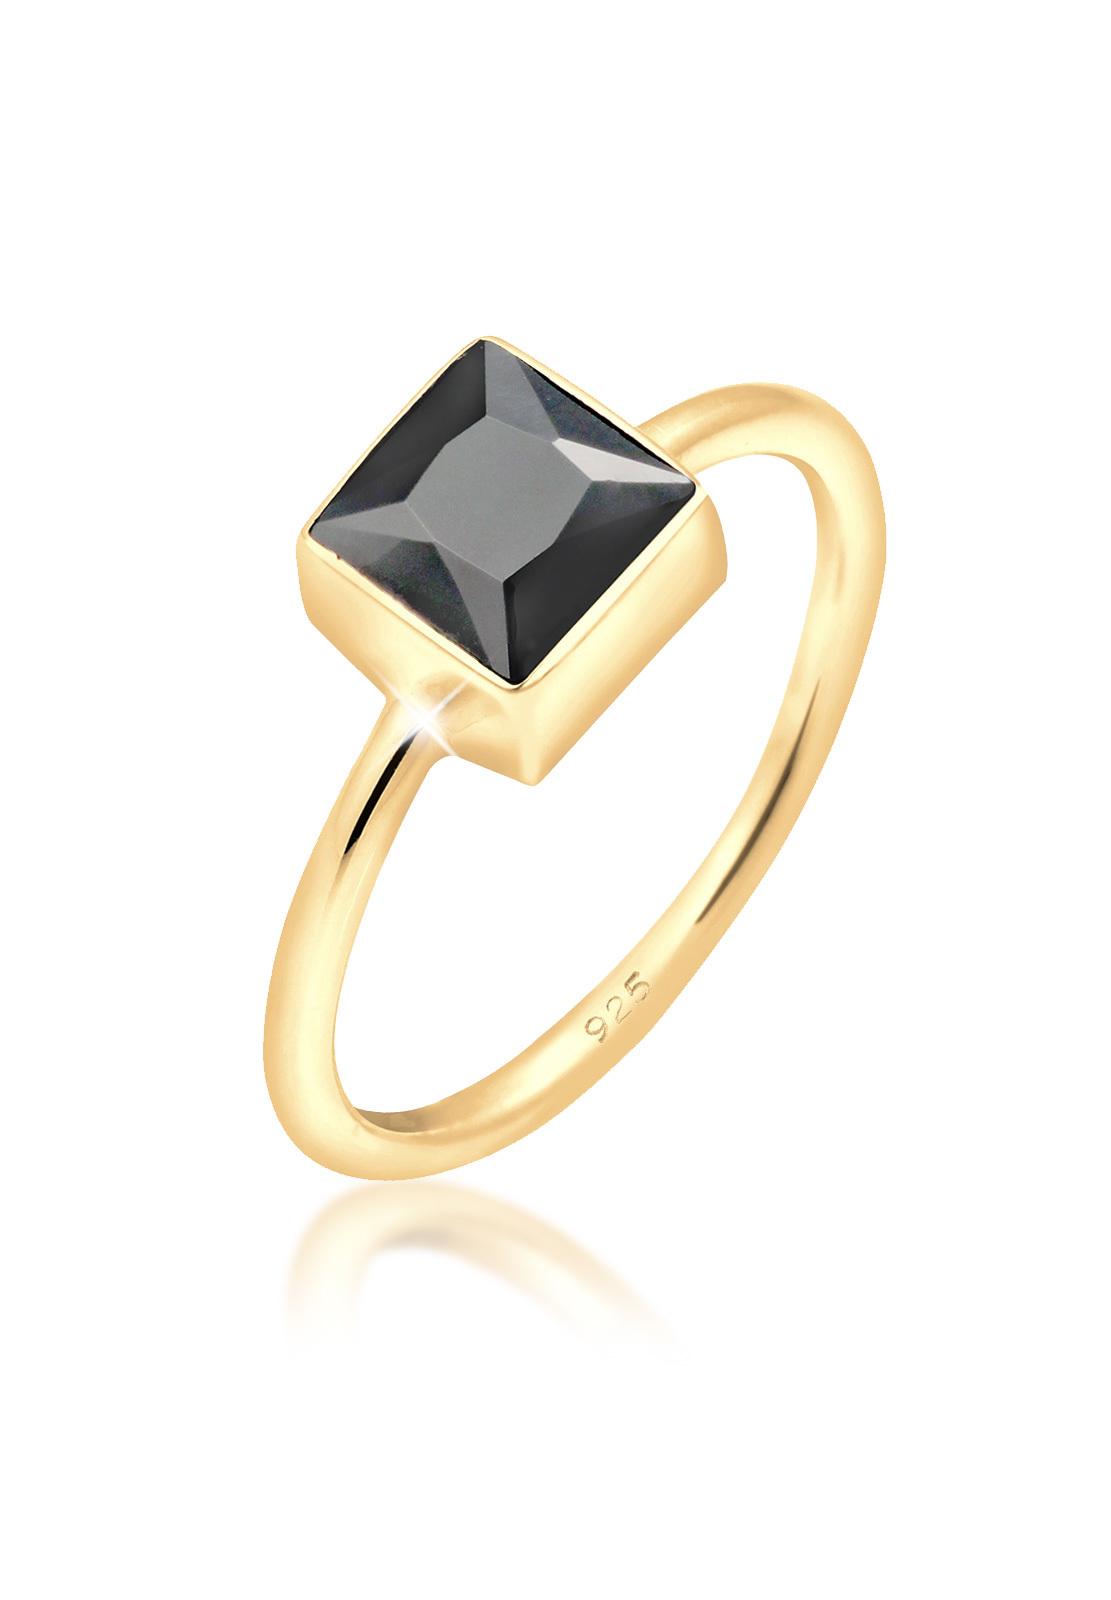 Ring   Zirkonia ( Schwarz )   925 Sterling Silber vergoldet